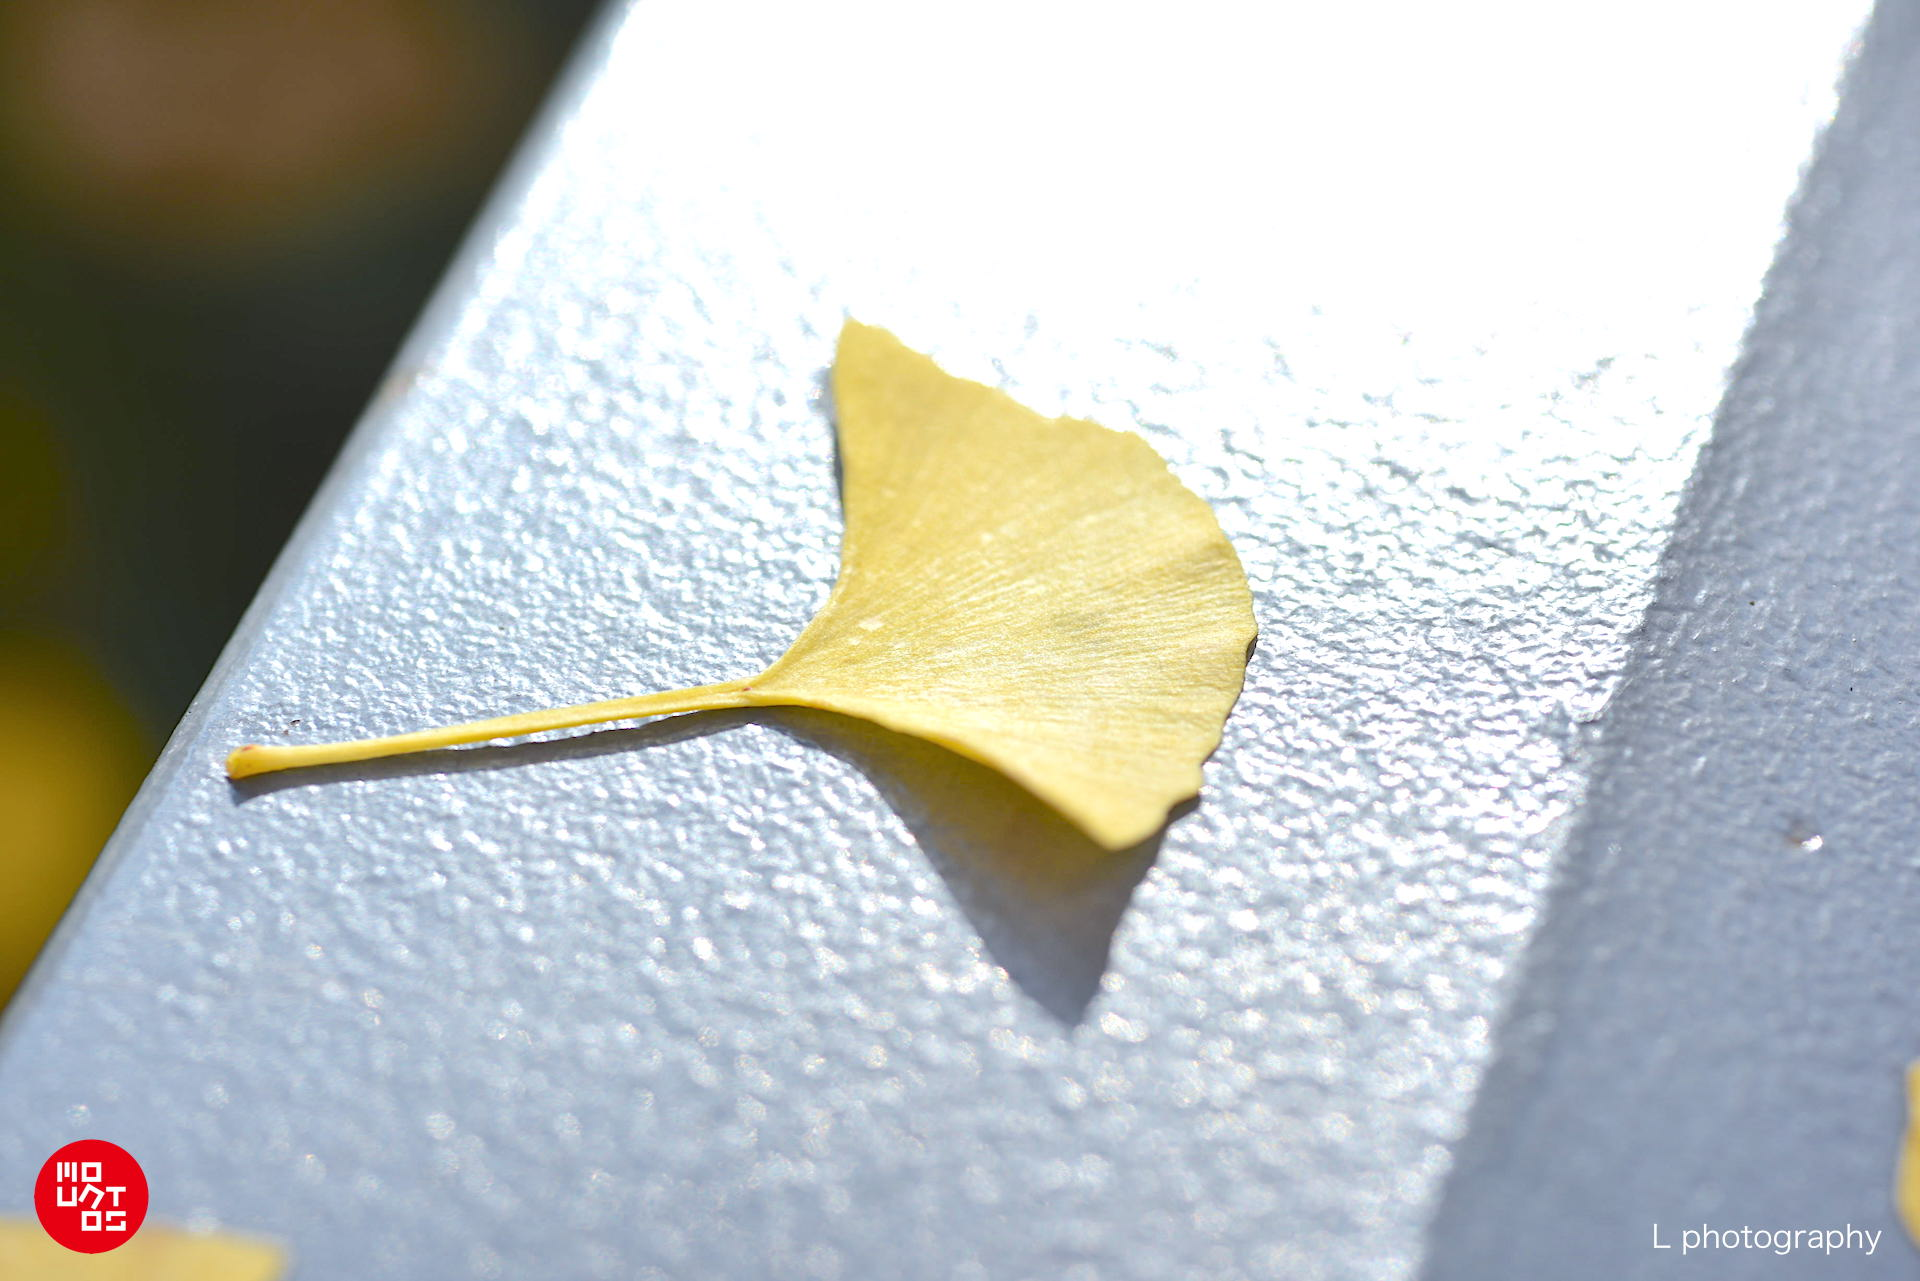 Ginkgo biloba leaf Yokohama Tokyo Japan autumn fall 旅遊新規|臺灣海關禁止出入機場攜帶違禁物品清單 違規罰款移送法辦